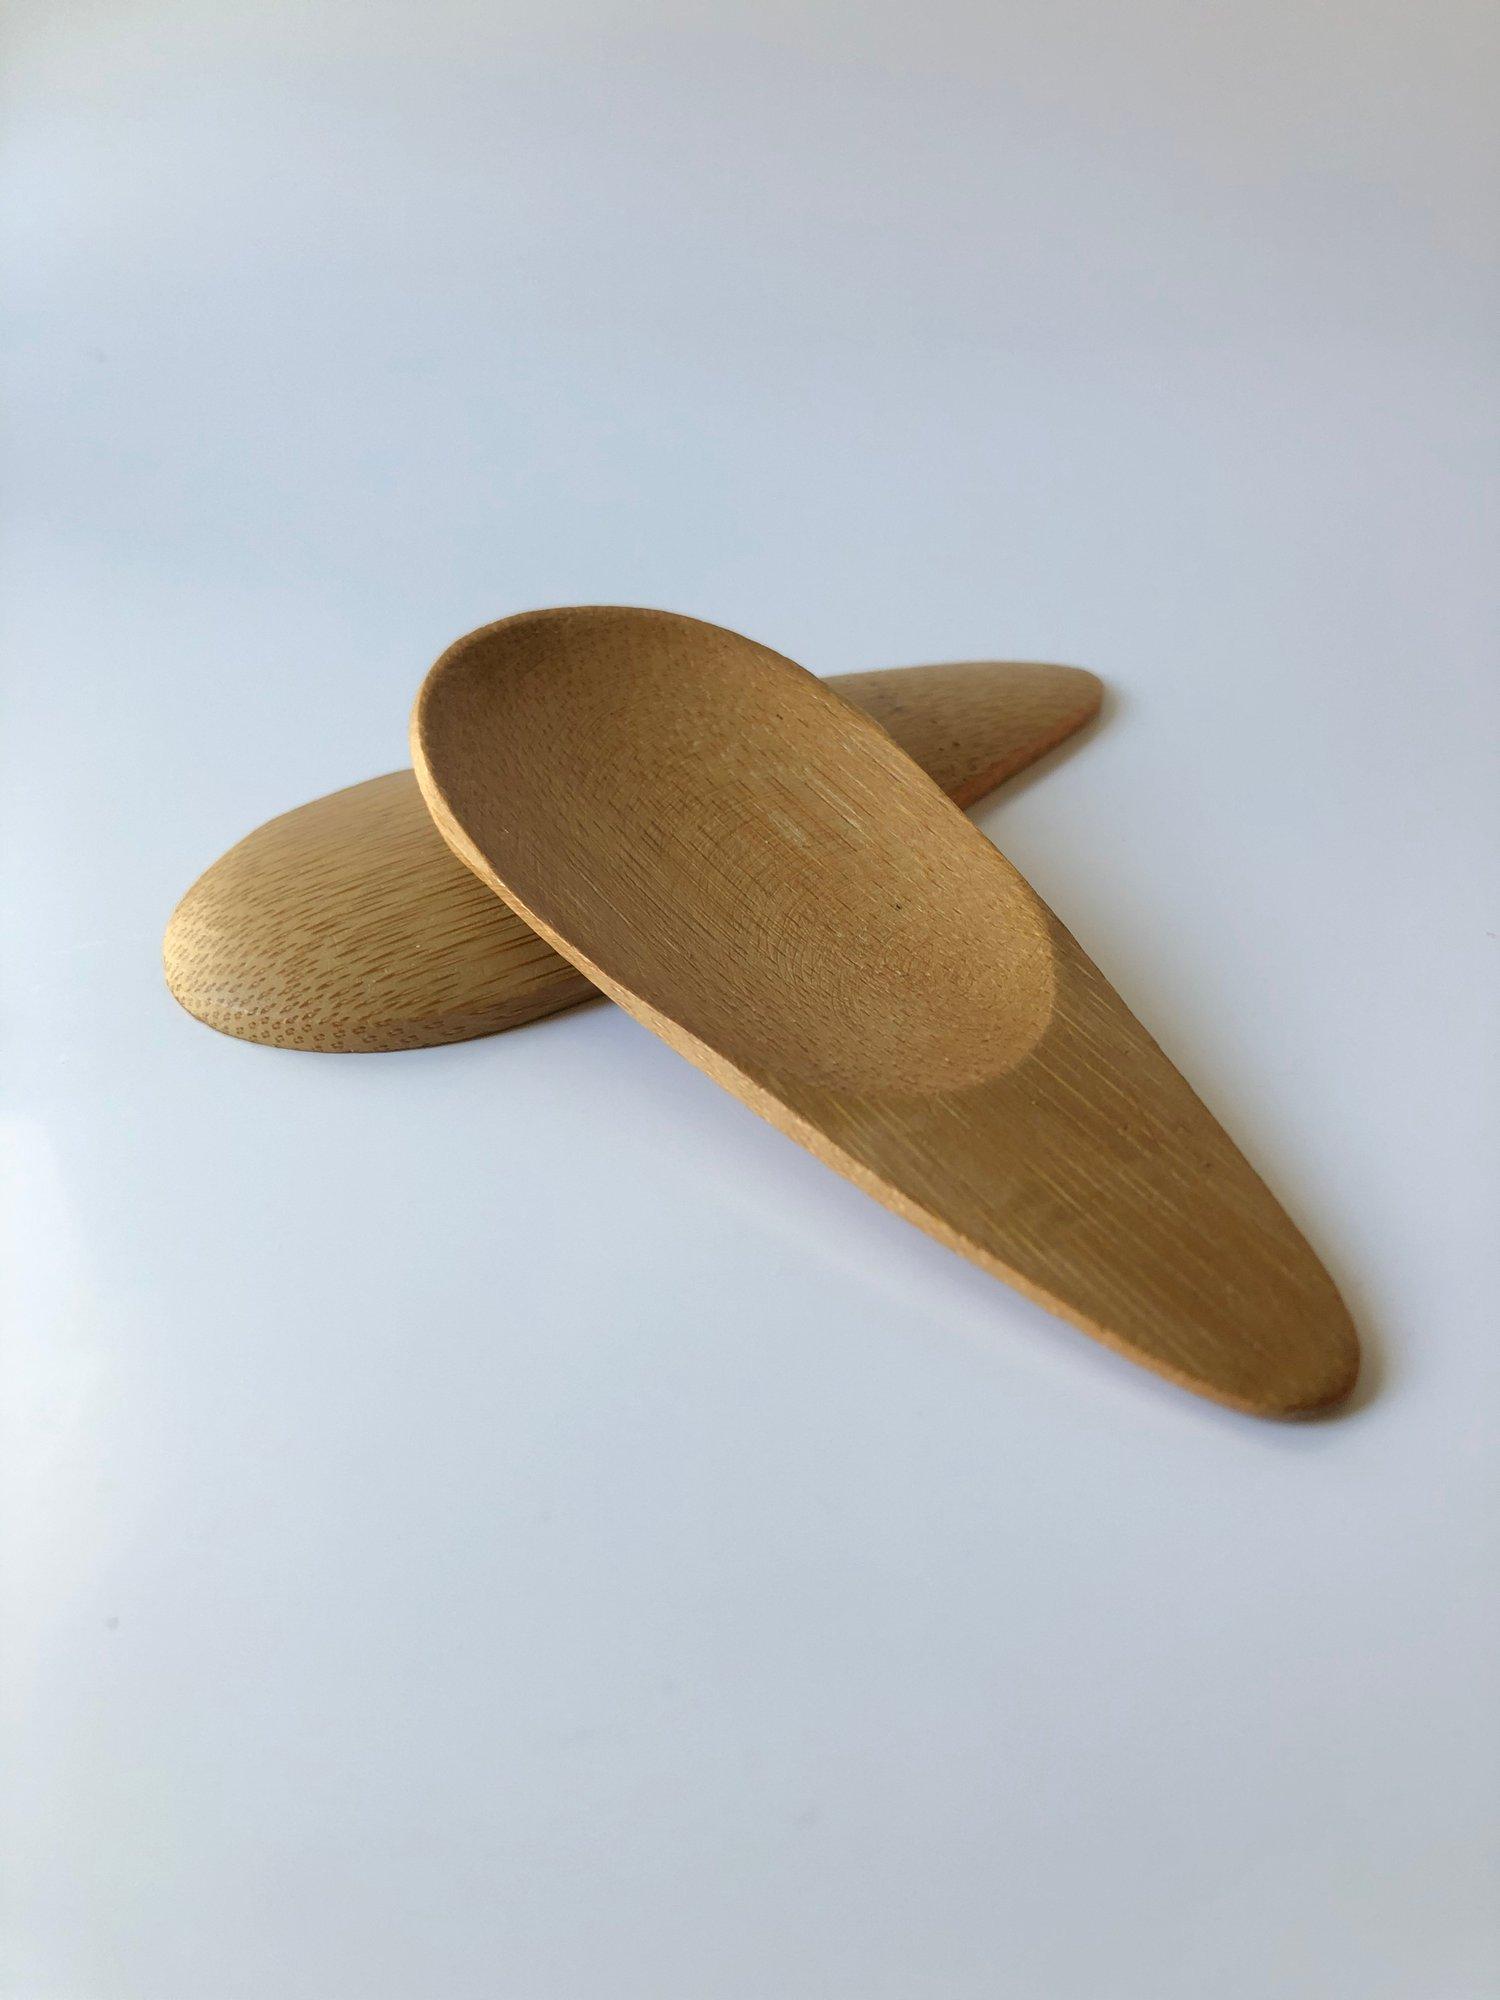 Image of Bamboo spatula/ applicator